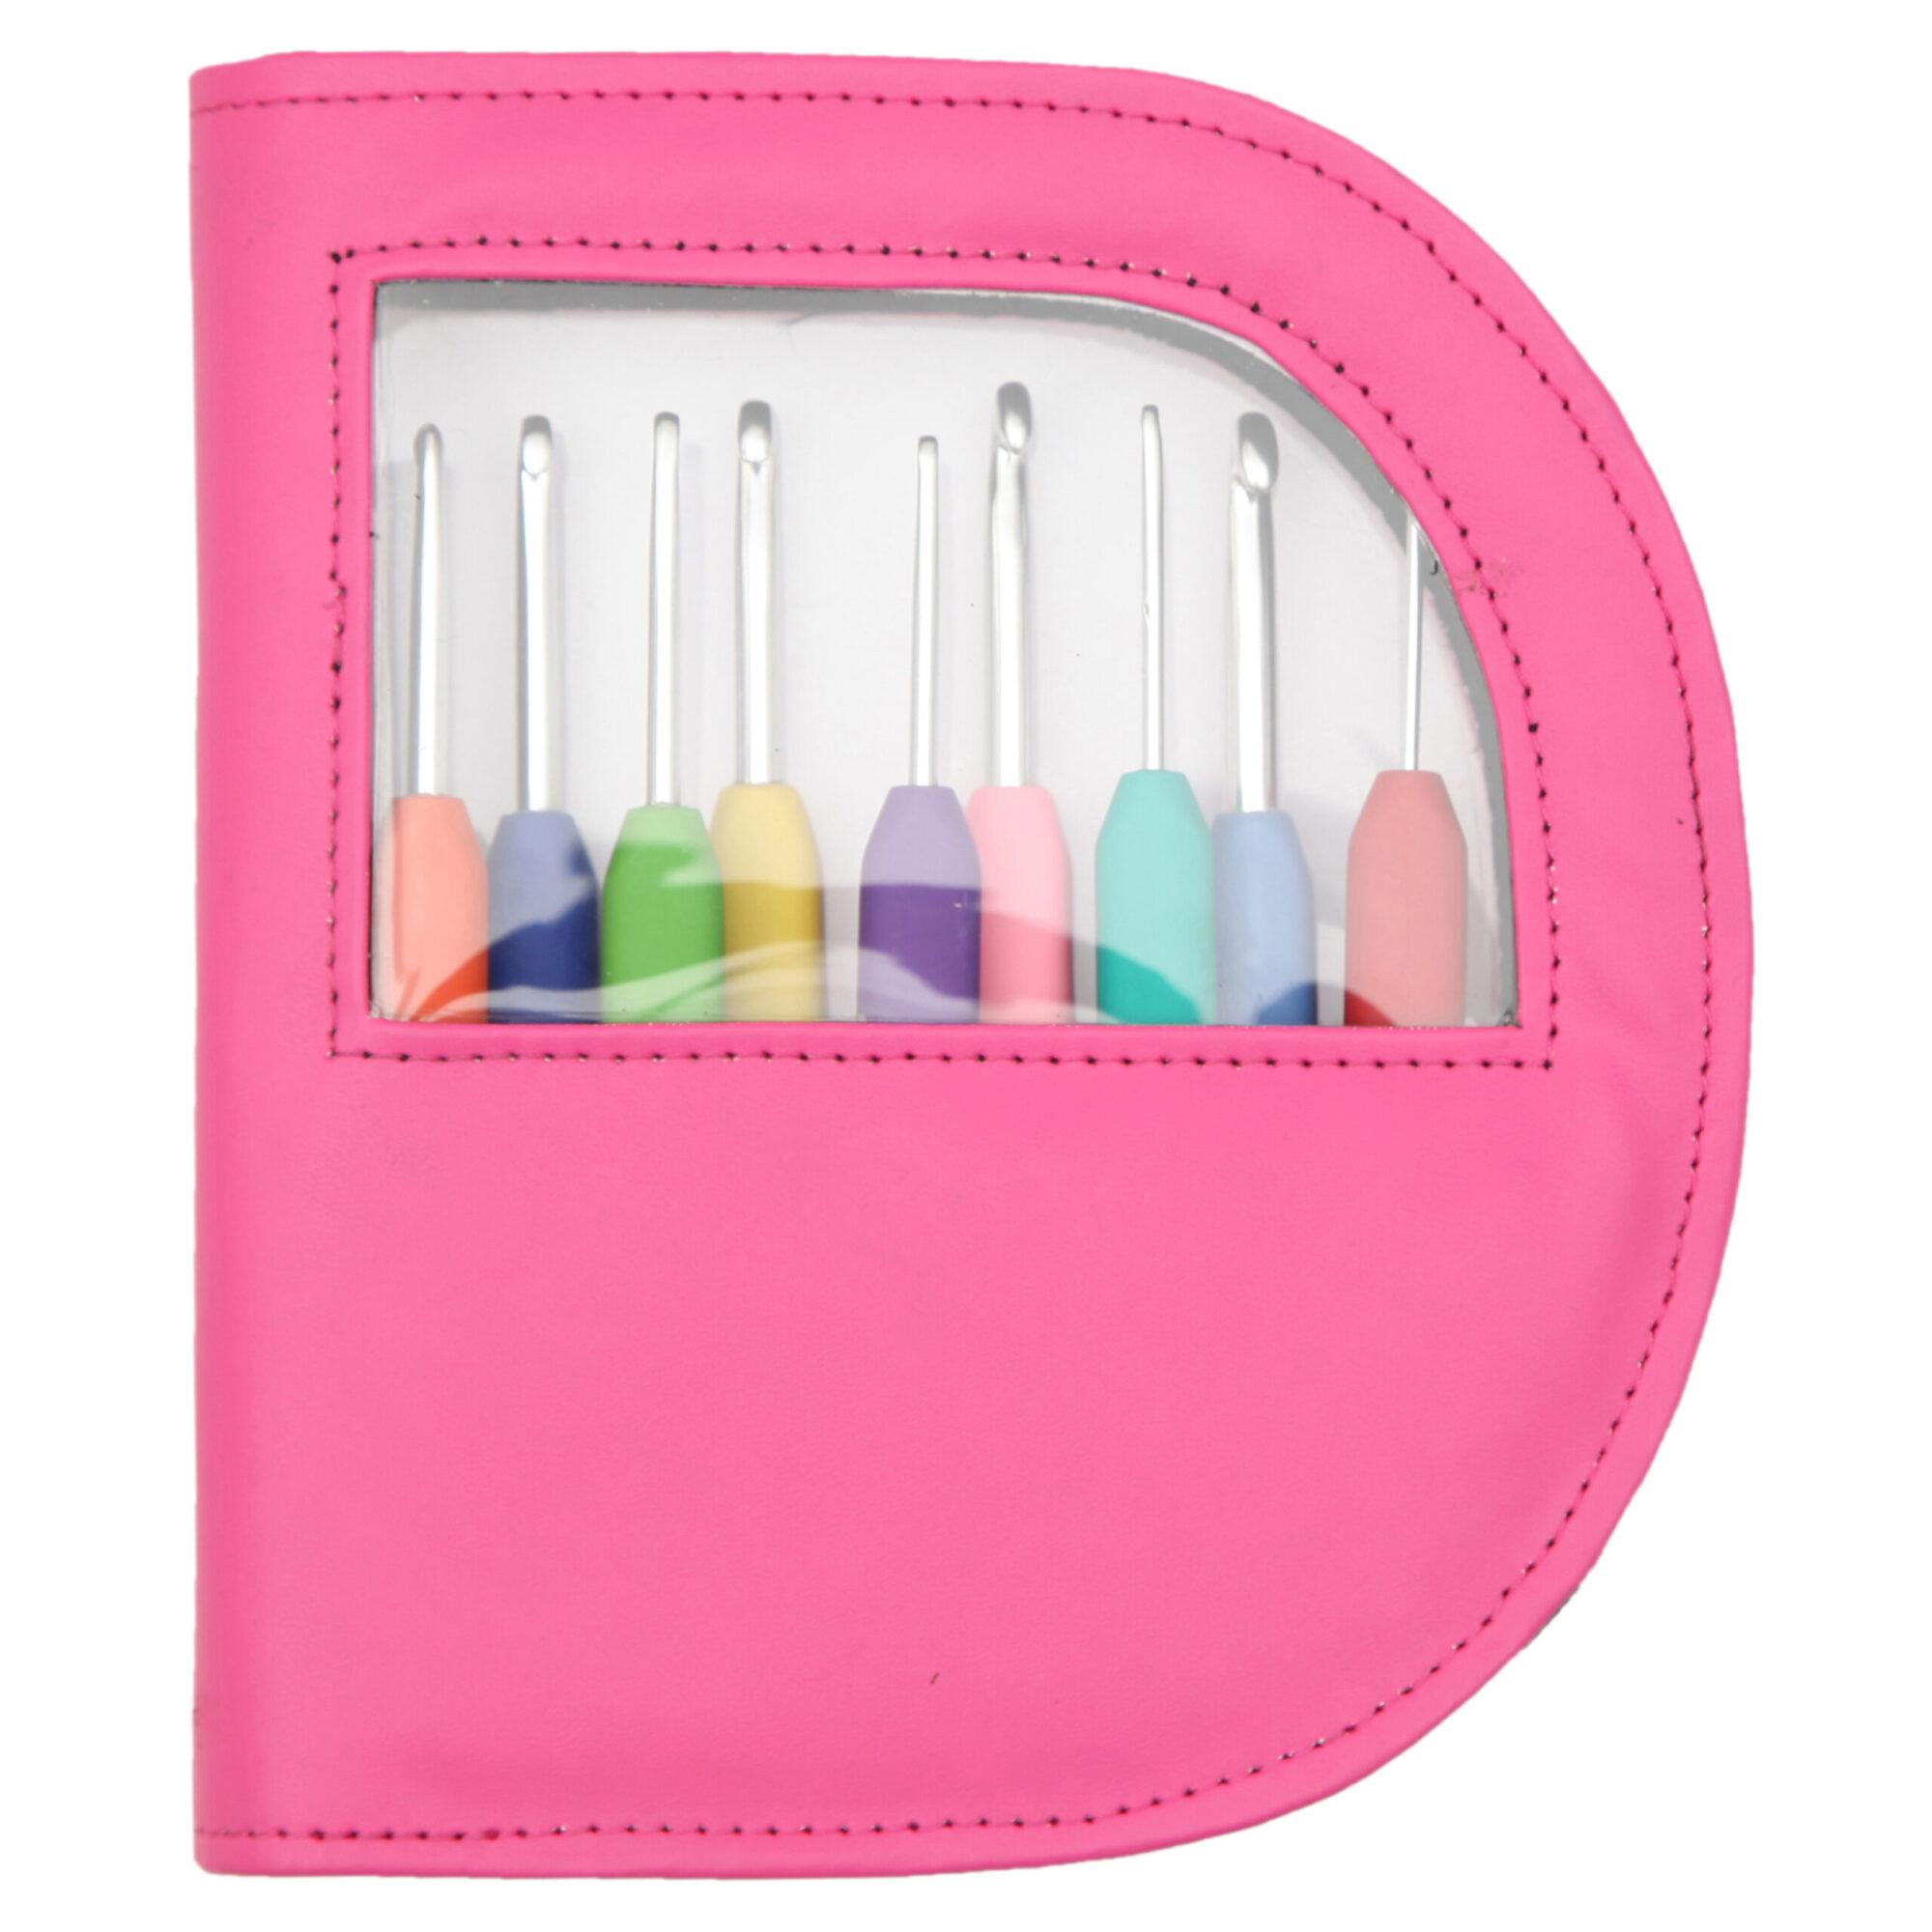 KnitPro – Waves Crochet Hook Set (Pink) product image